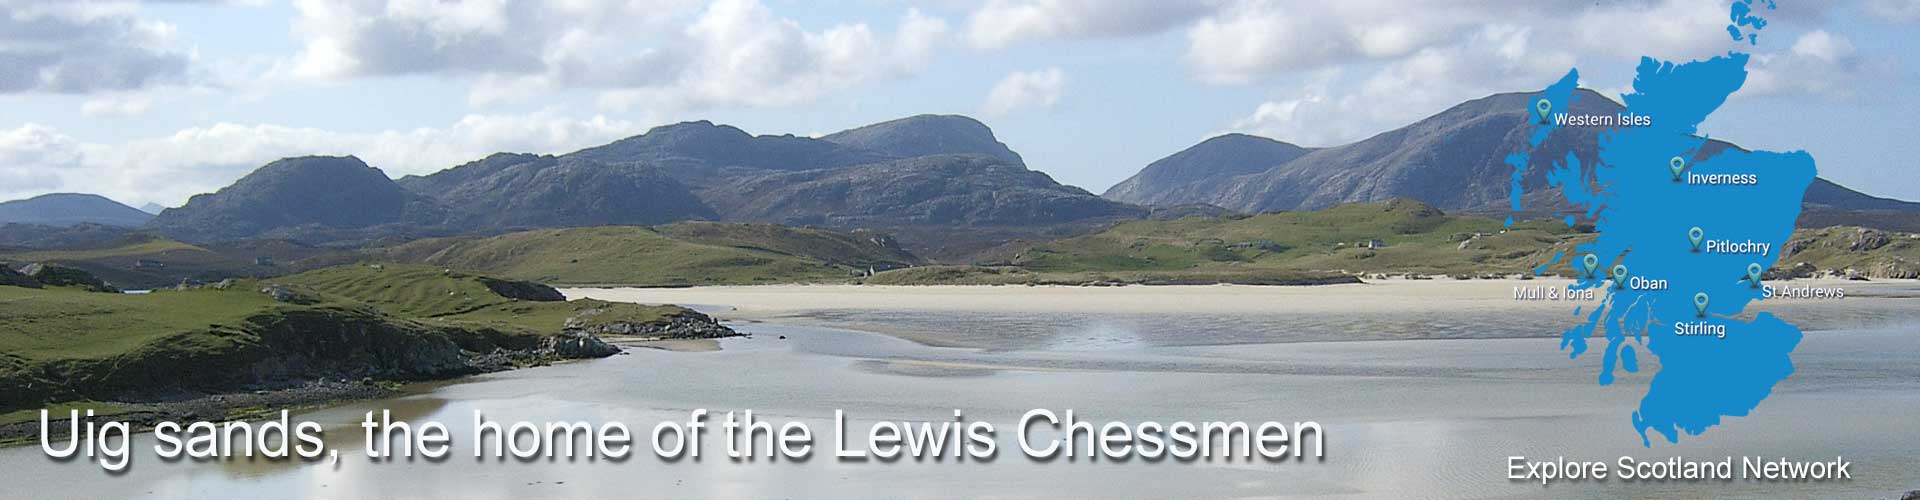 Isle of Lewis chessmen